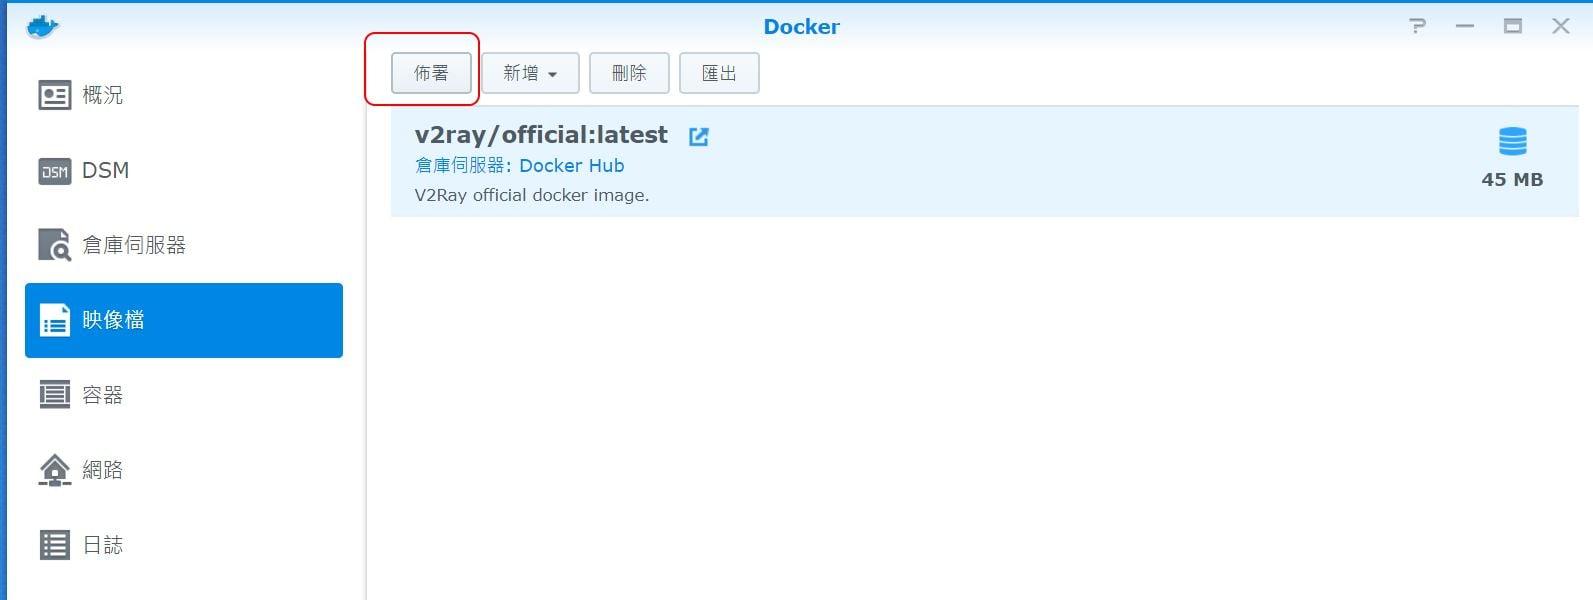 Synology NAS Docker 安裝V2Ray (3/16新增備份設定檔教學) - NAS